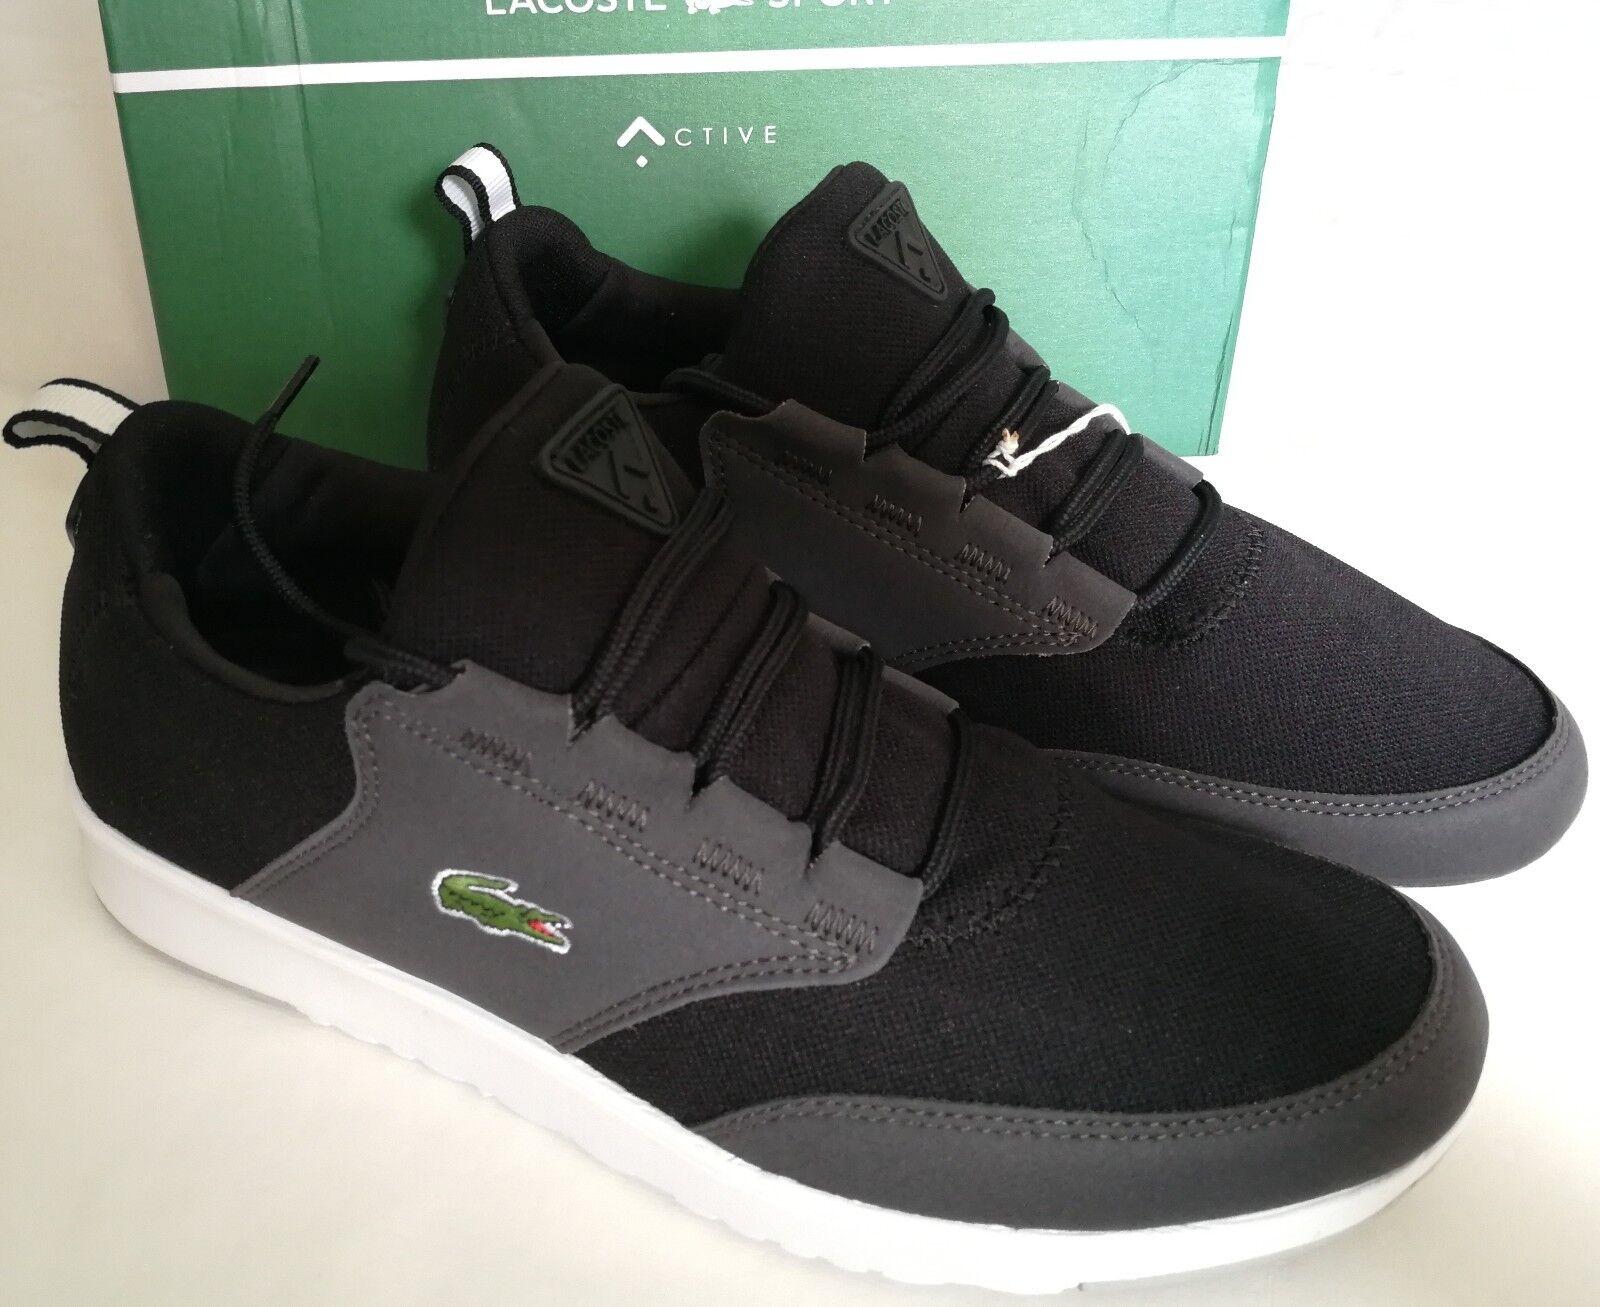 Lacoste Schuhe Light PIQ SPM BLK/ (UK BLK (UK BLK/ TXT/ SYN Schwarz Grau 42 823636